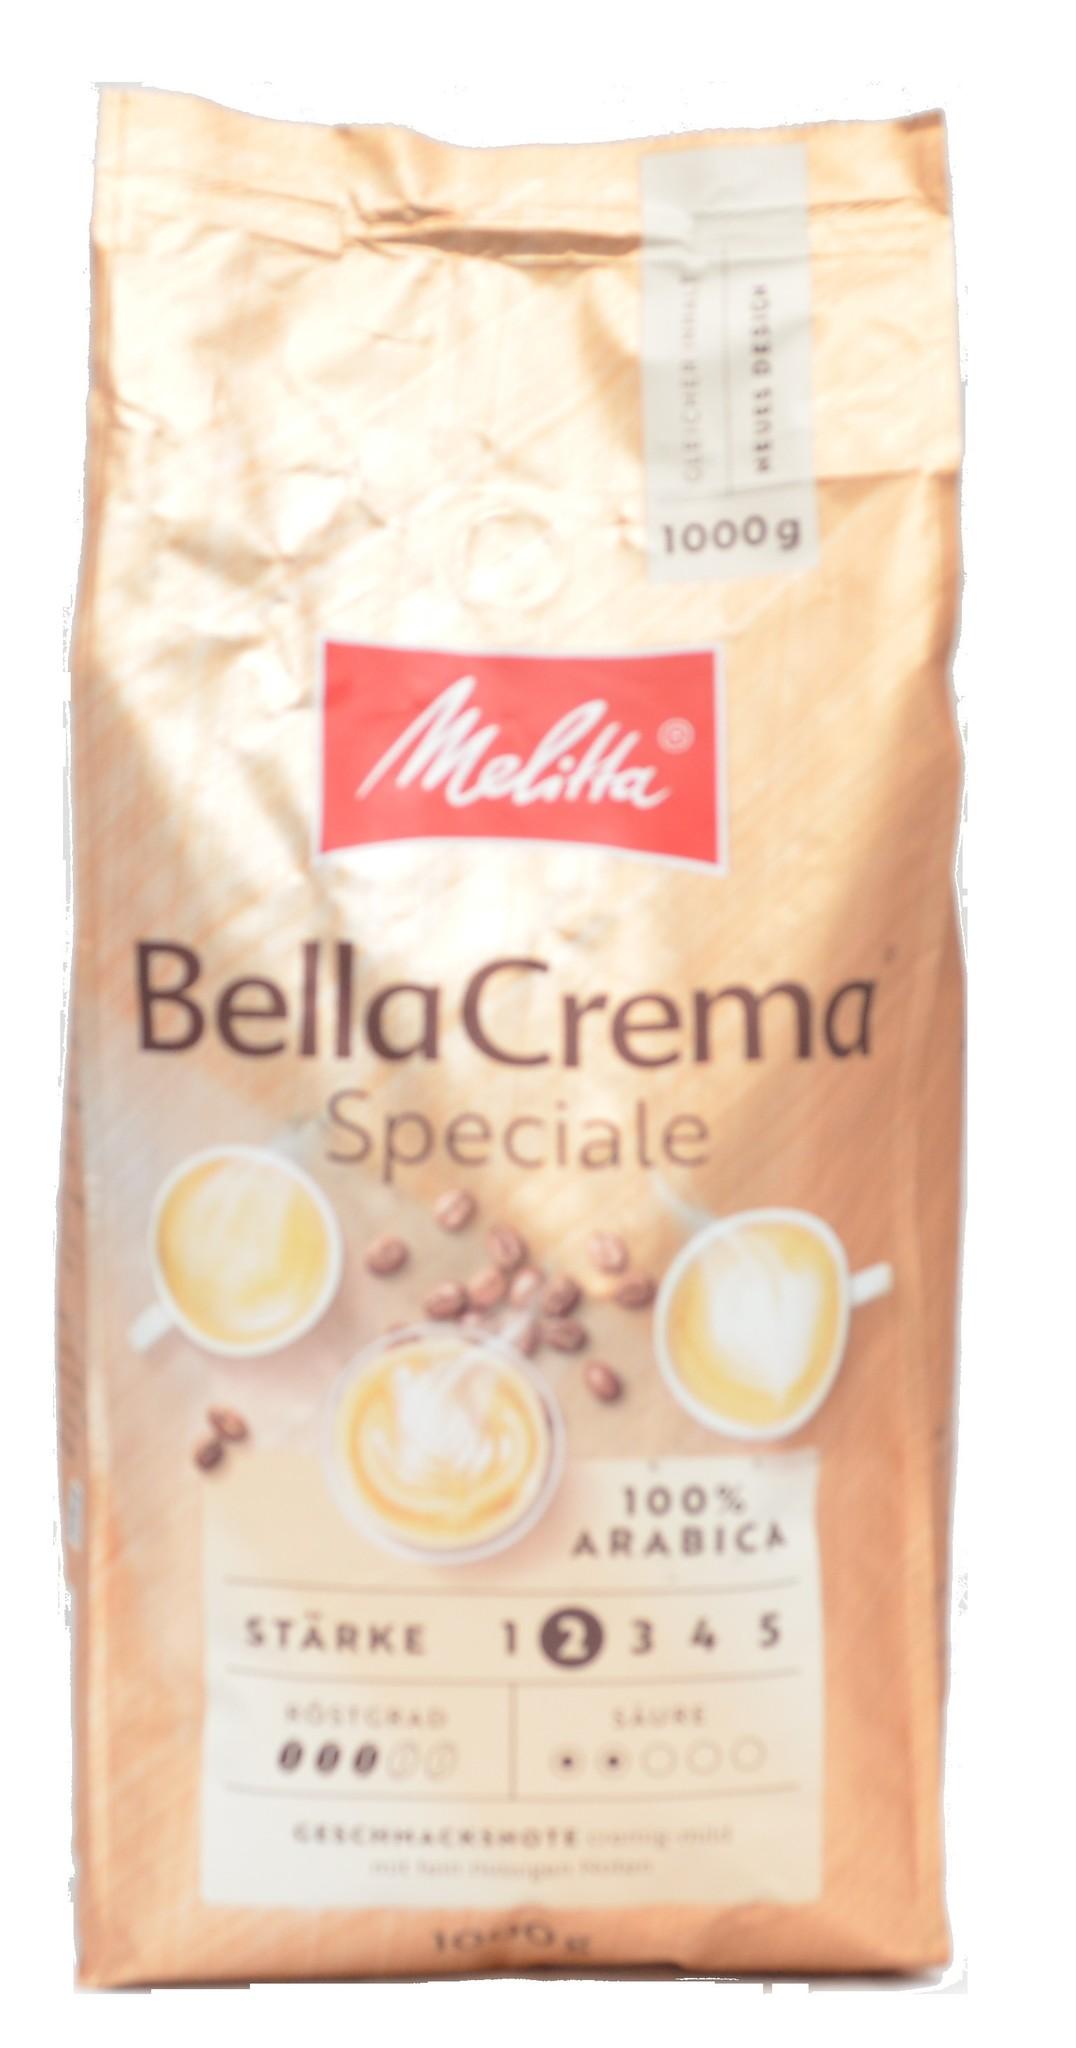 Melitta Bellacrema speciale bonen 1 kg vanaf € 8.00